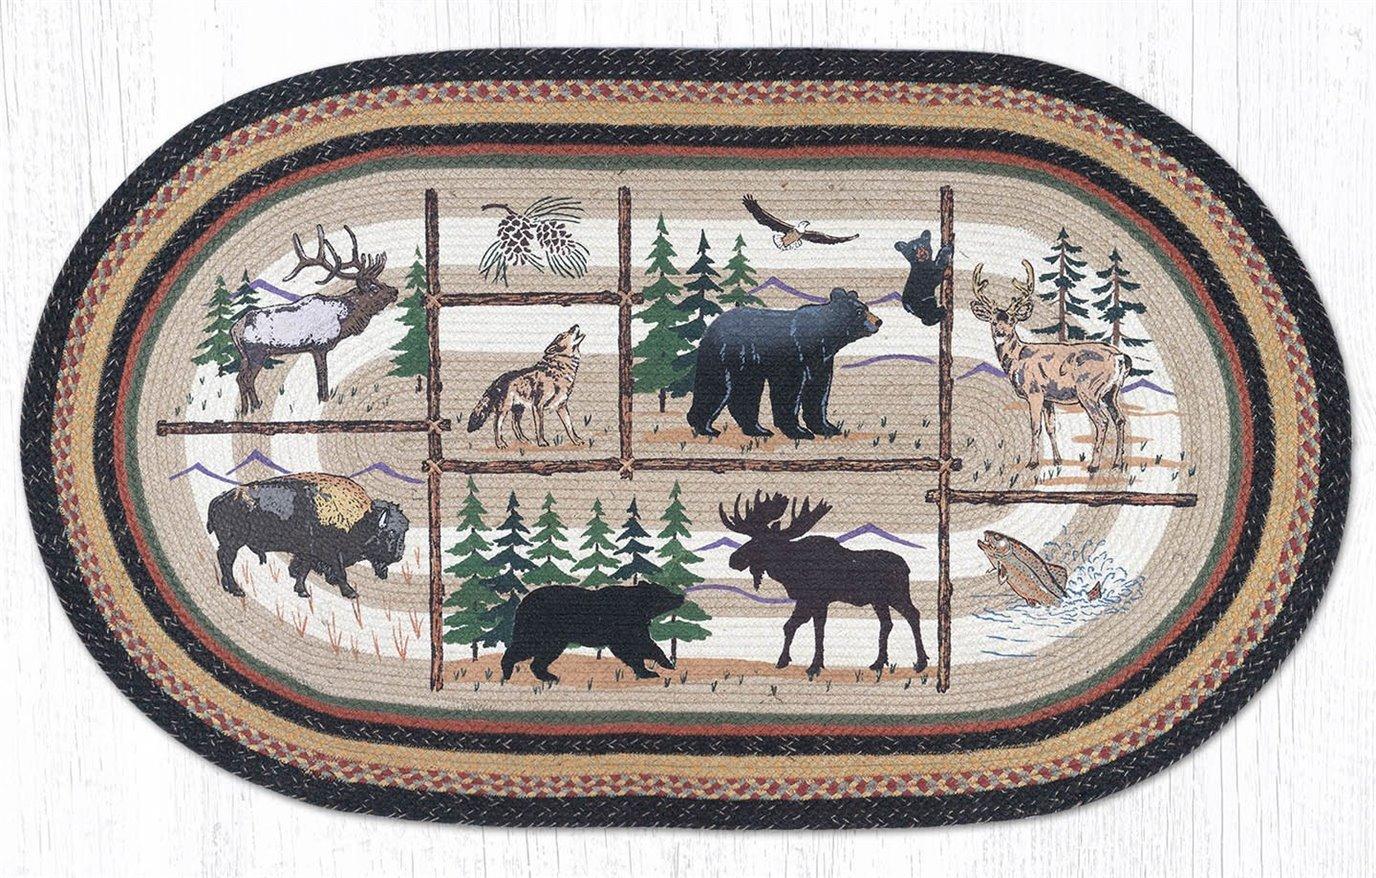 Lodge Animals Oval Braided Rug 4'x6'